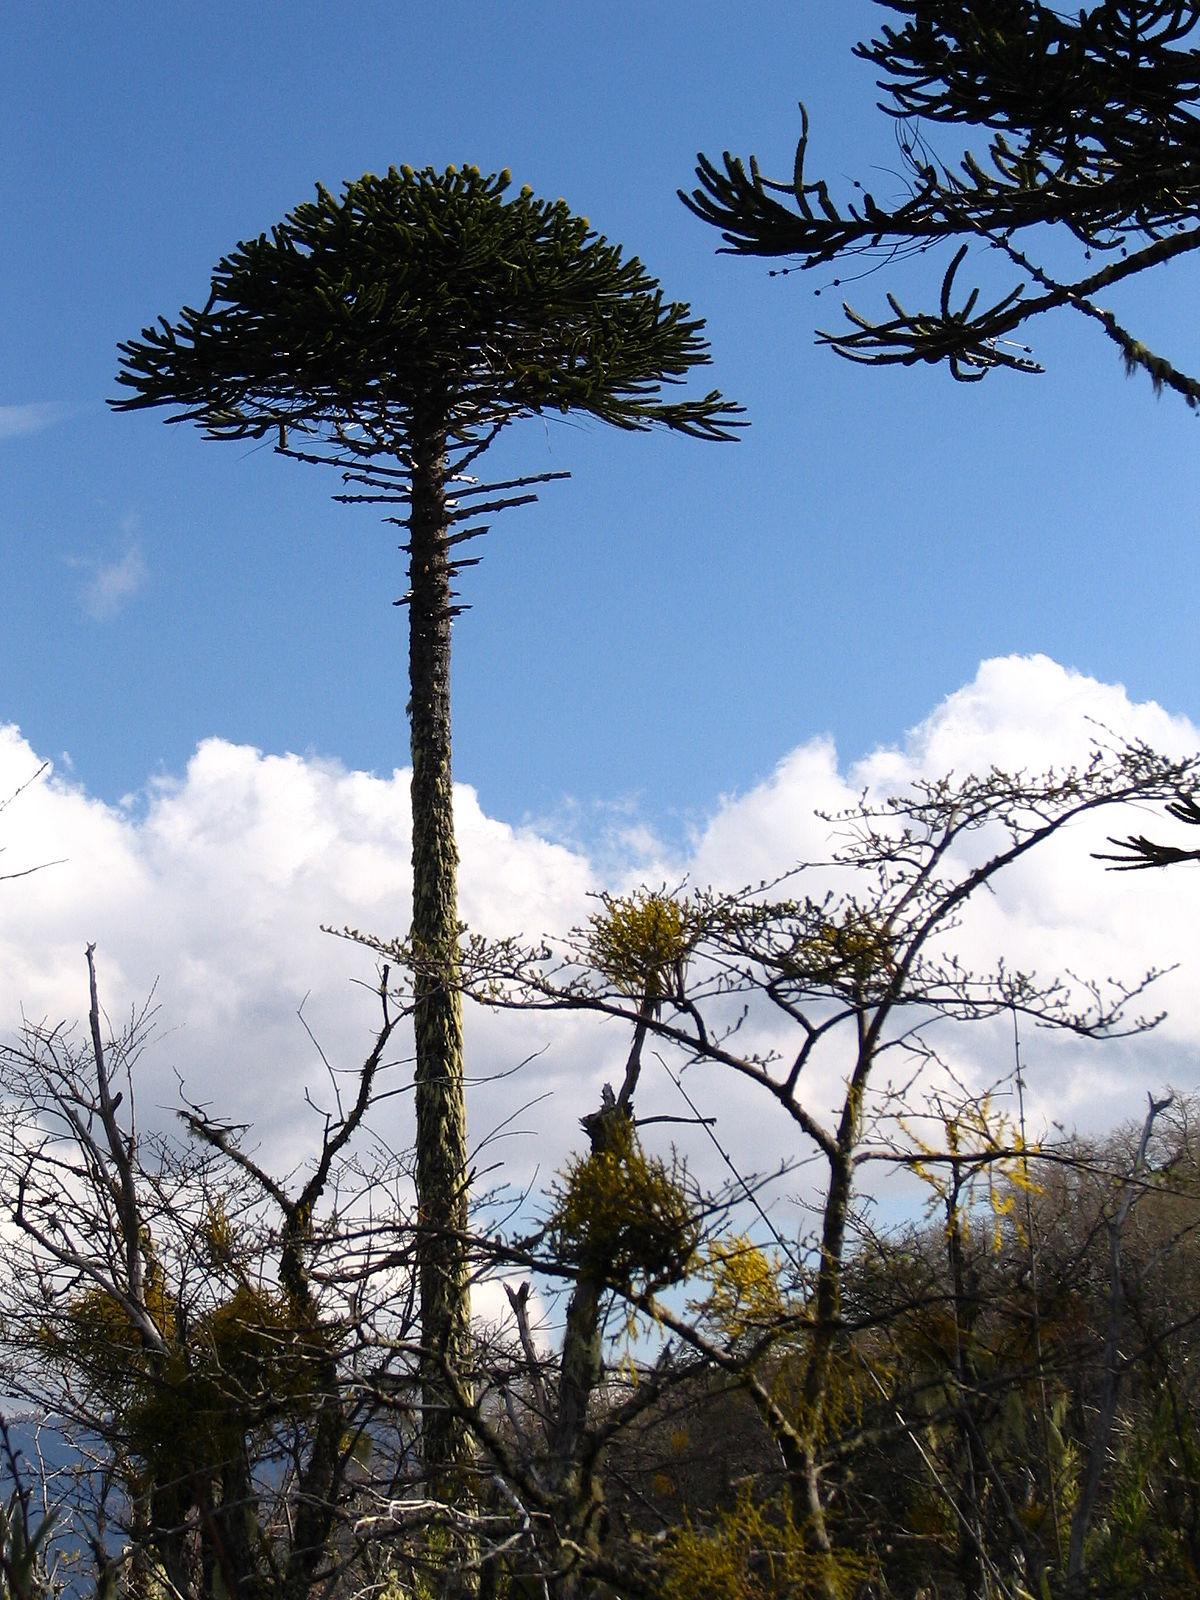 araucaria araucana wikipedia